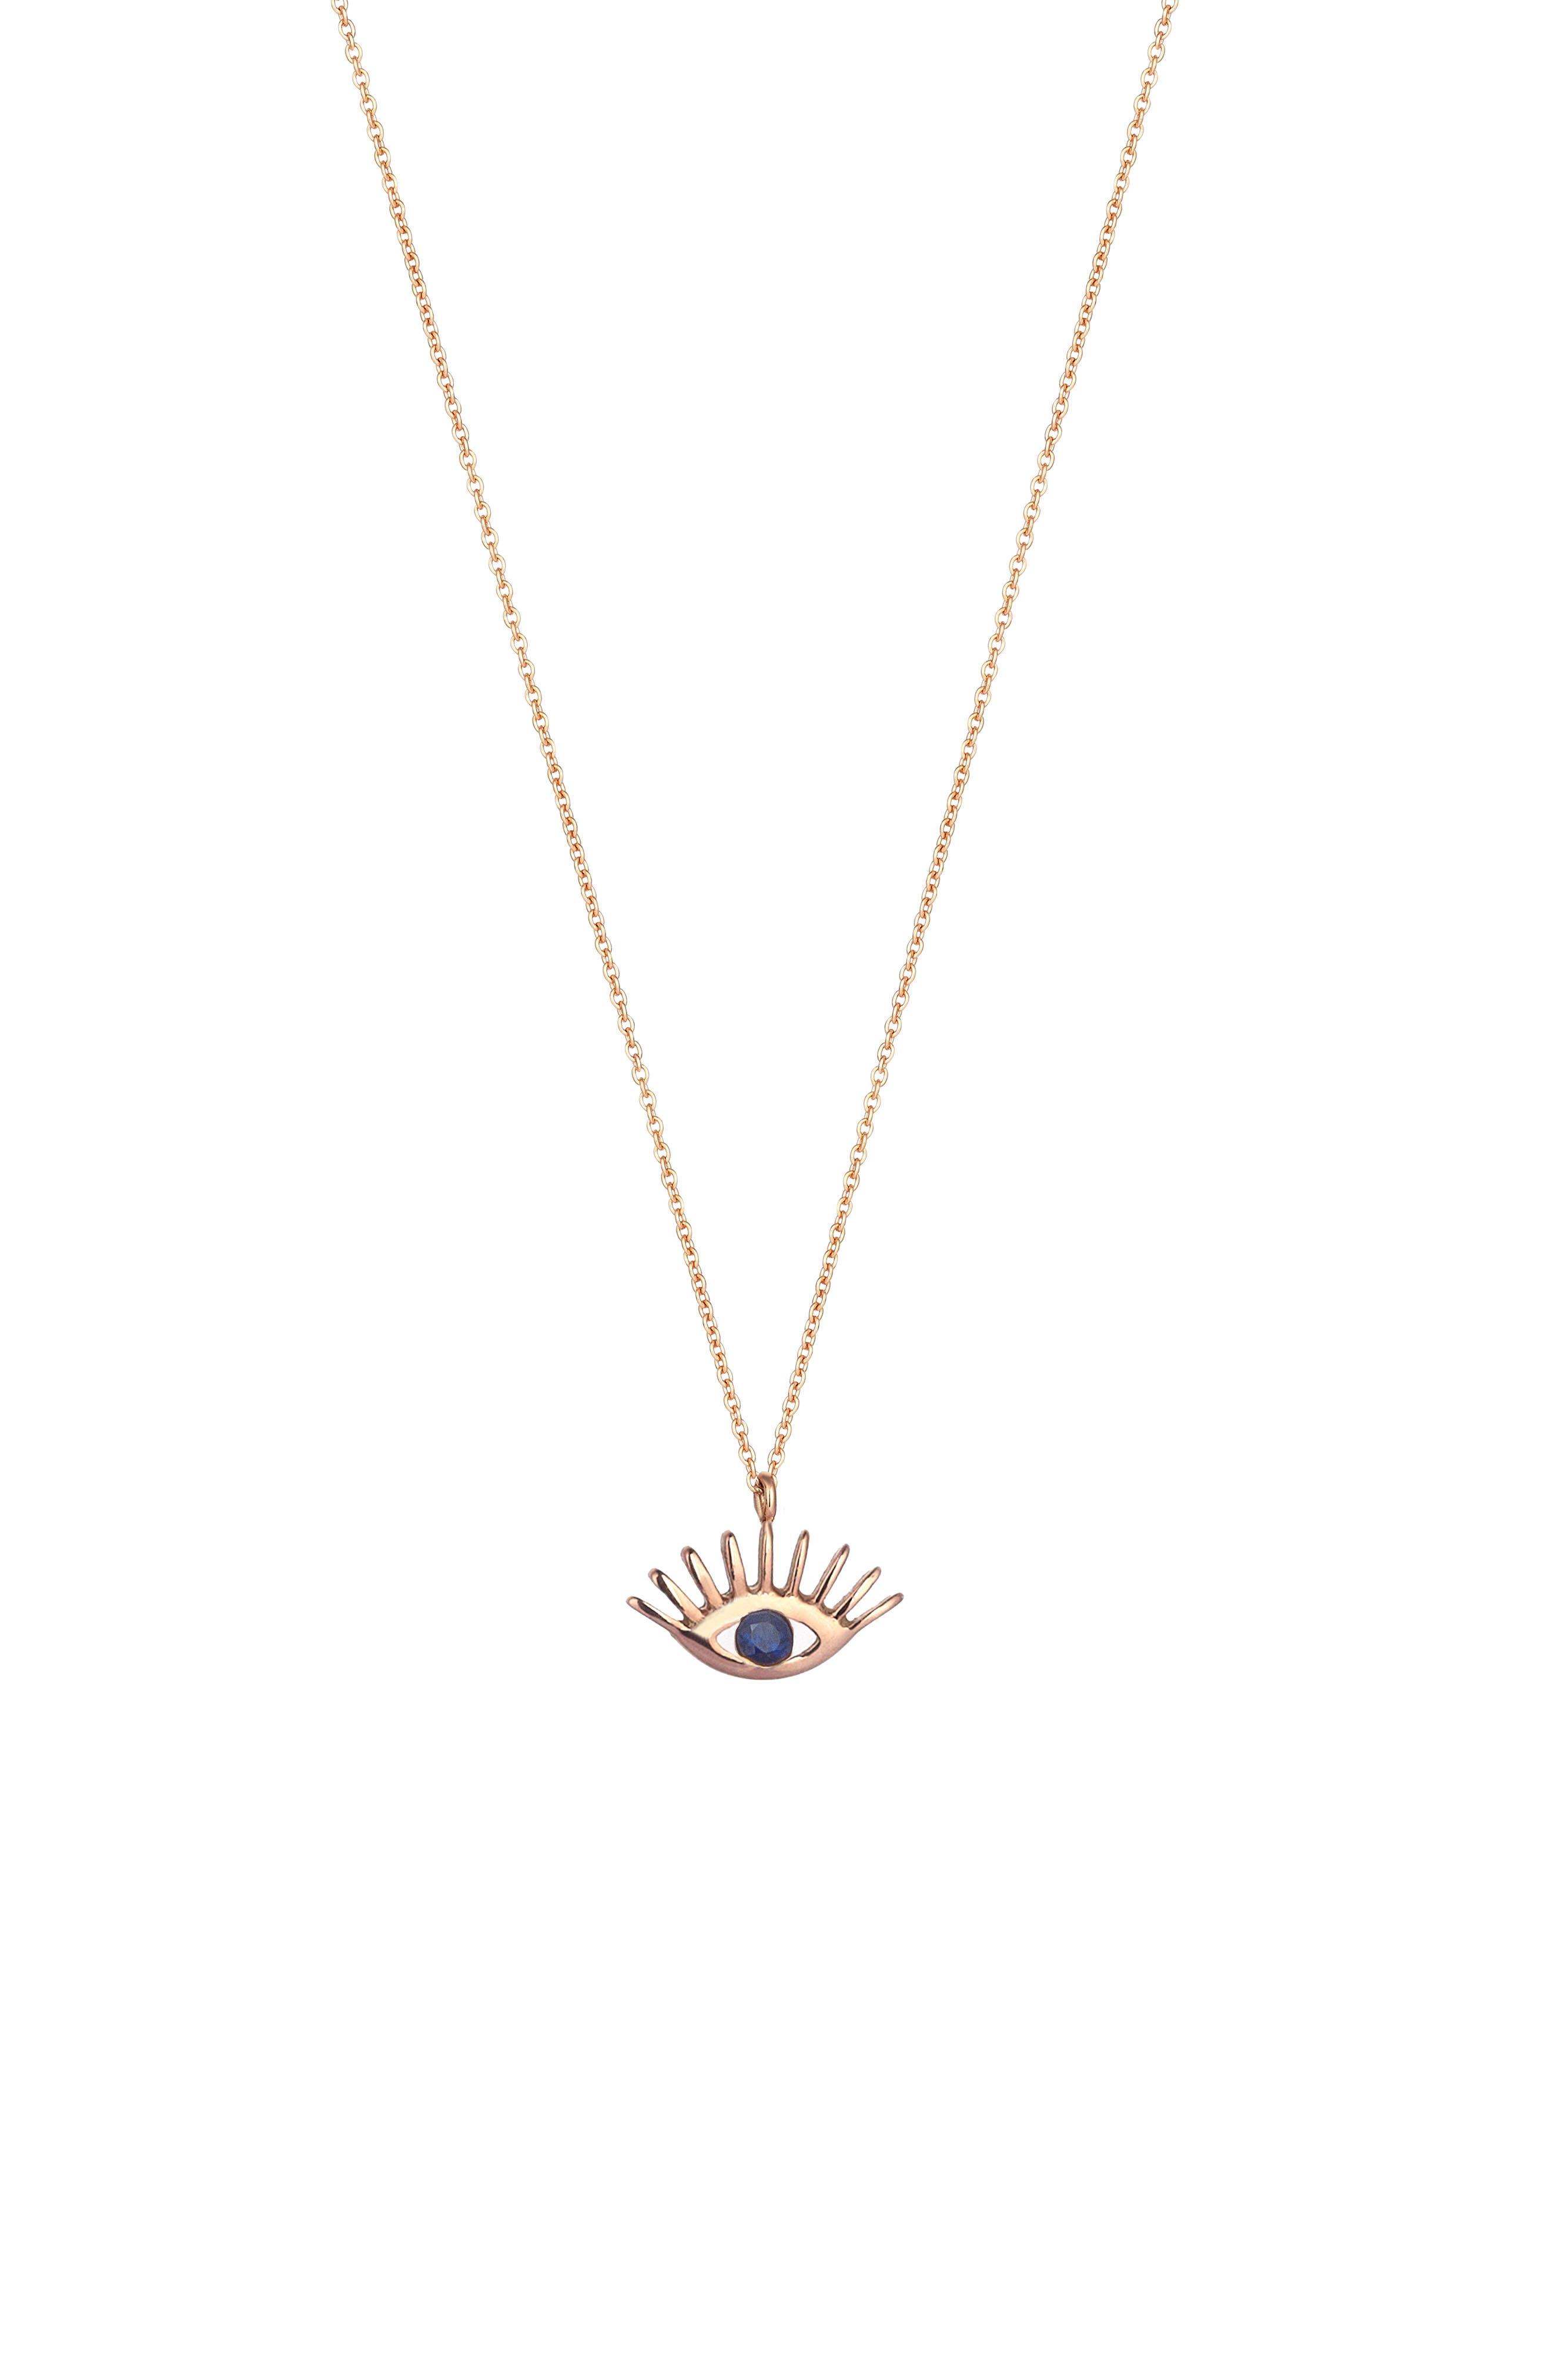 KISMET BY MILKA, Sapphire Pendant Necklace, Main thumbnail 1, color, ROSE GOLD